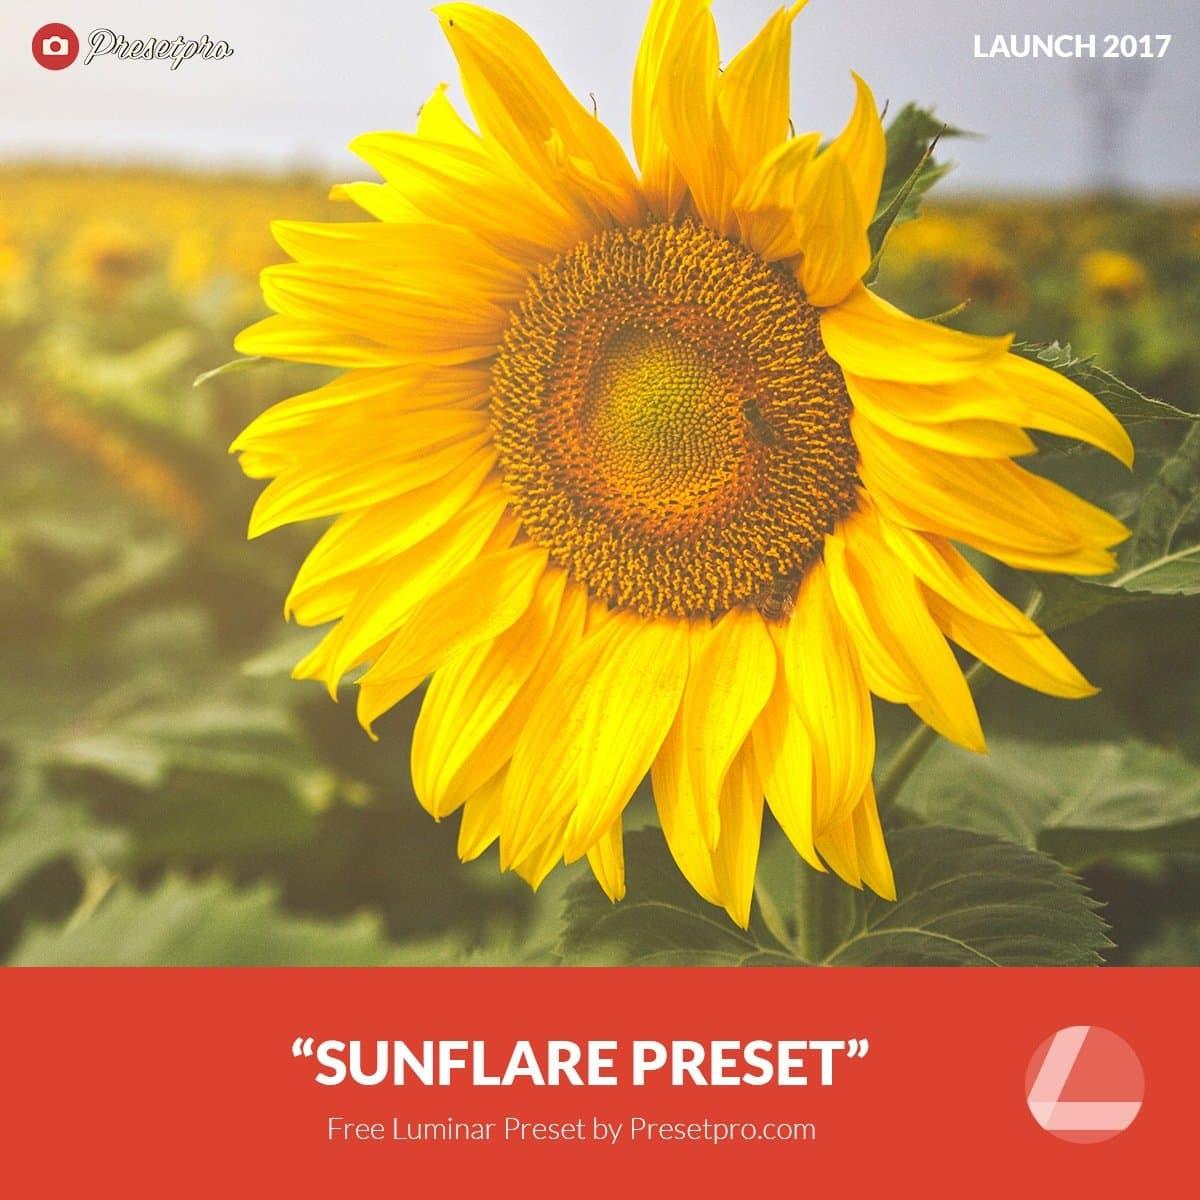 Free-Luminar-Preset-Sunflare